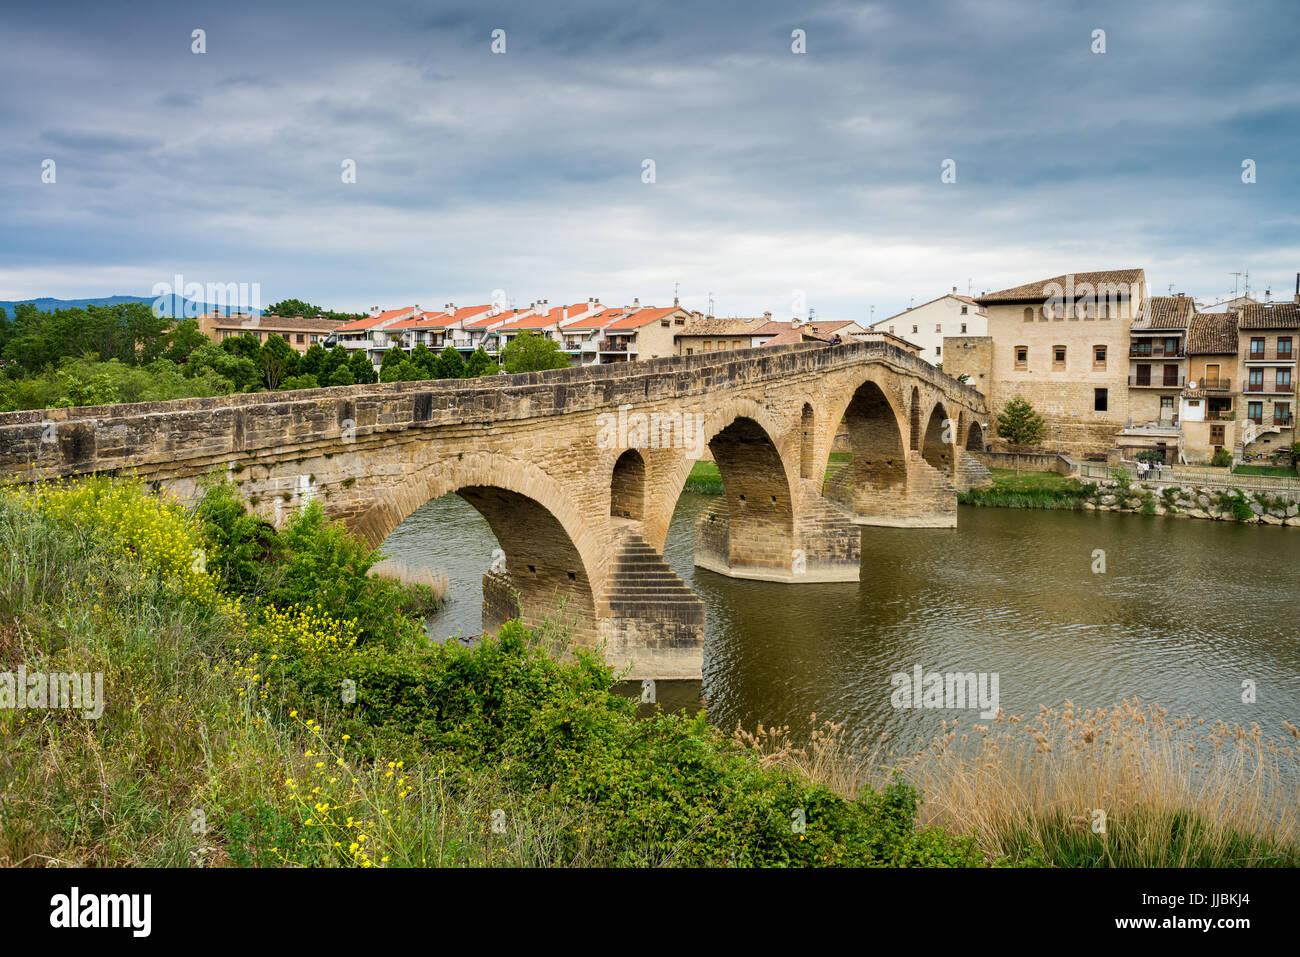 Romanesque bridge (Puente Románico)  in Puente la Reina, Navarre, Spain. - Stock Image